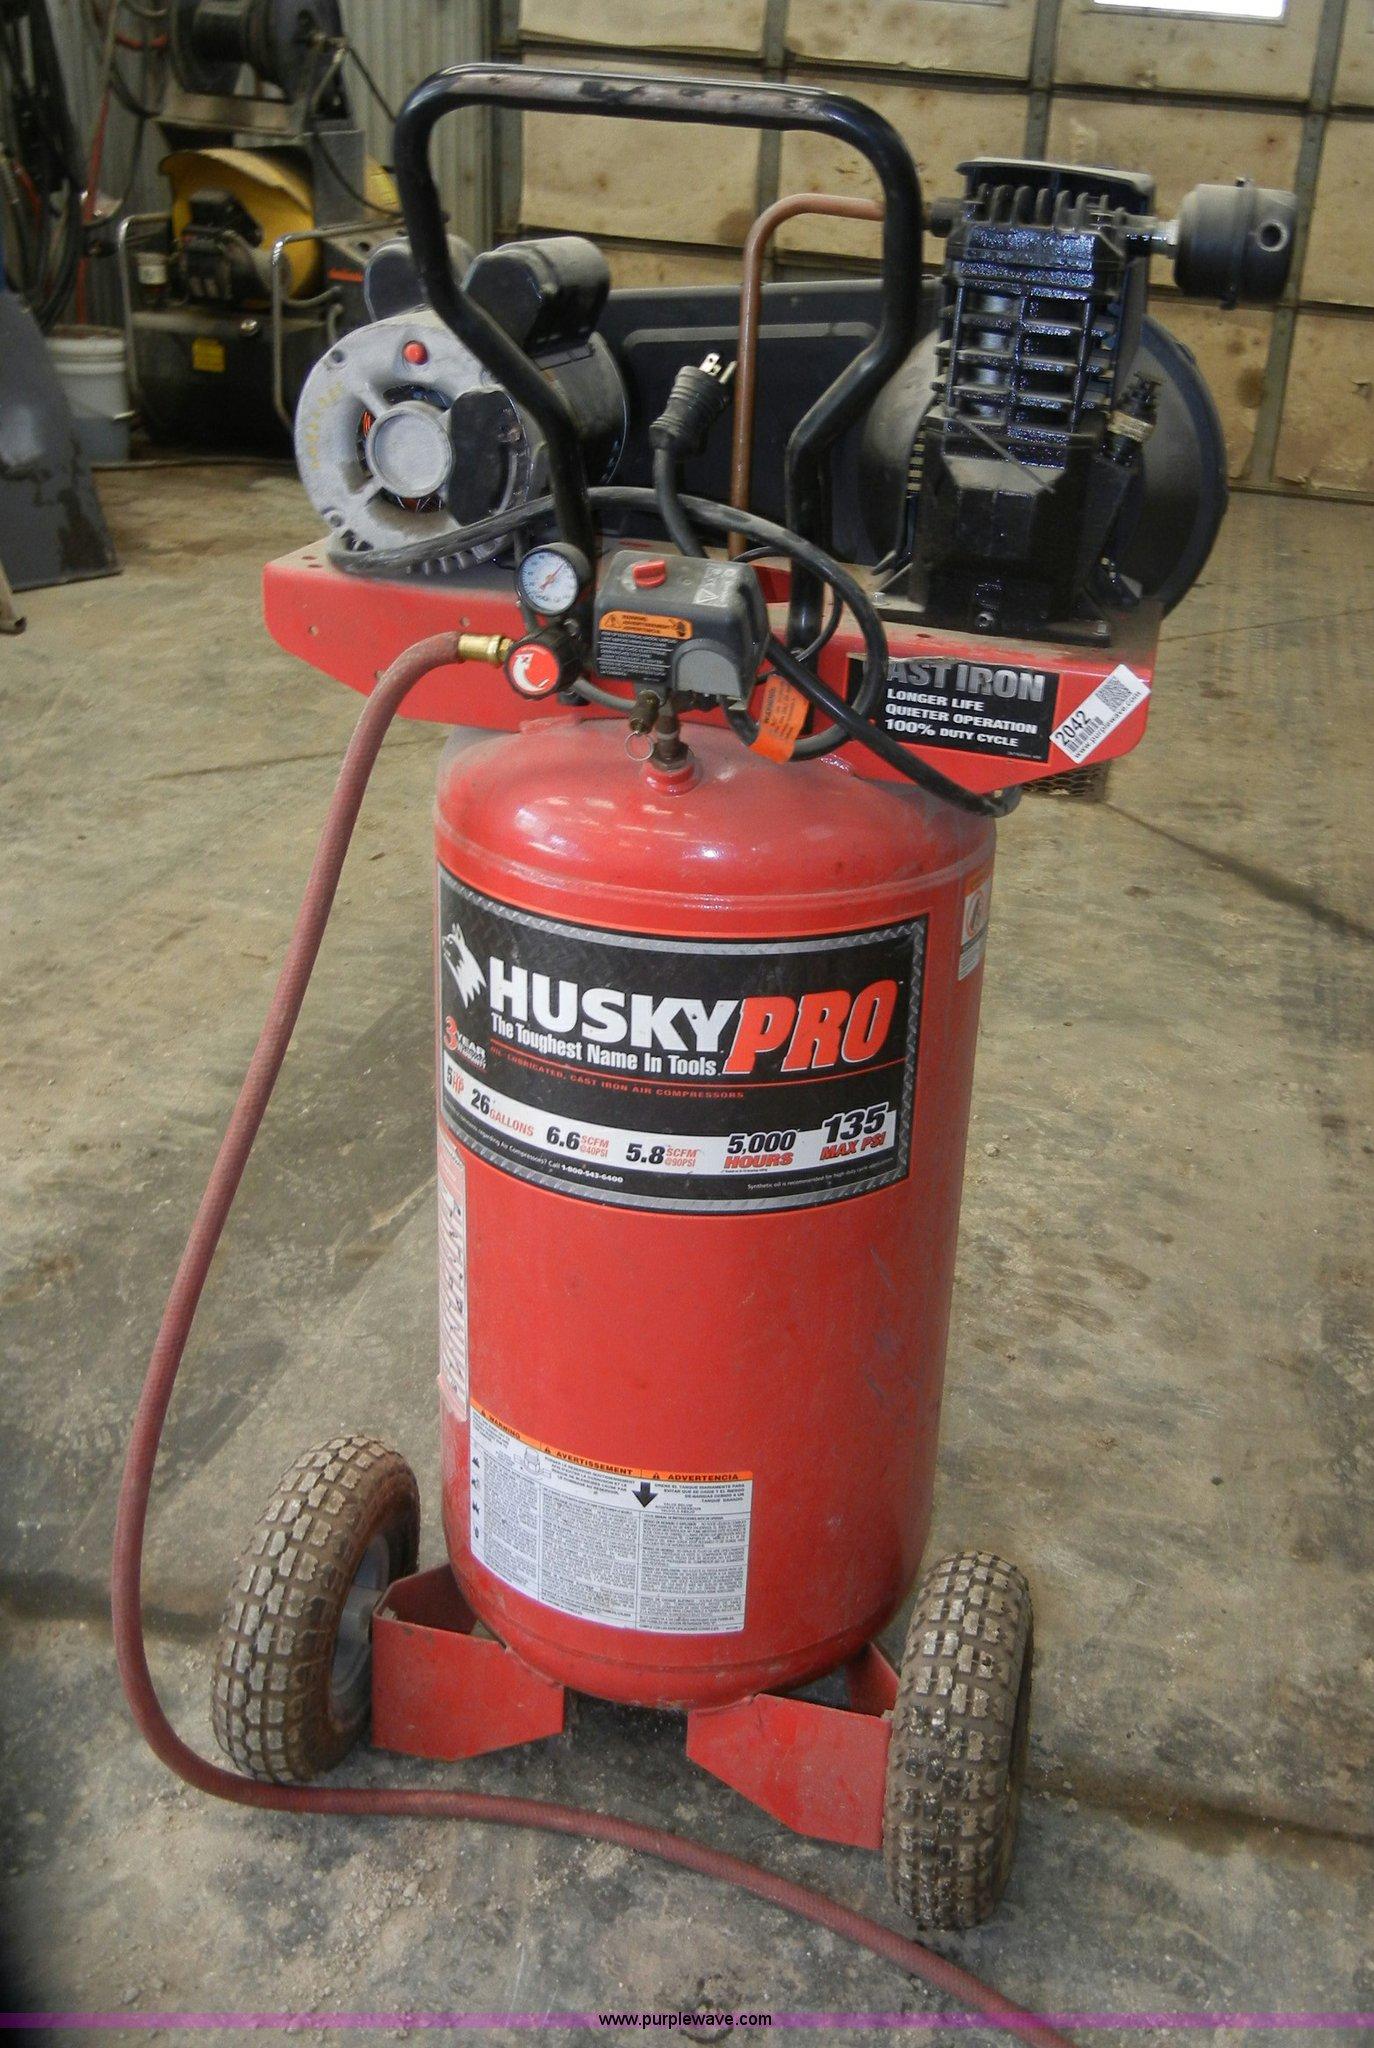 Husky pro 26 gallon air compressor item 2042 sold may for Manhattan motors manhattan ks